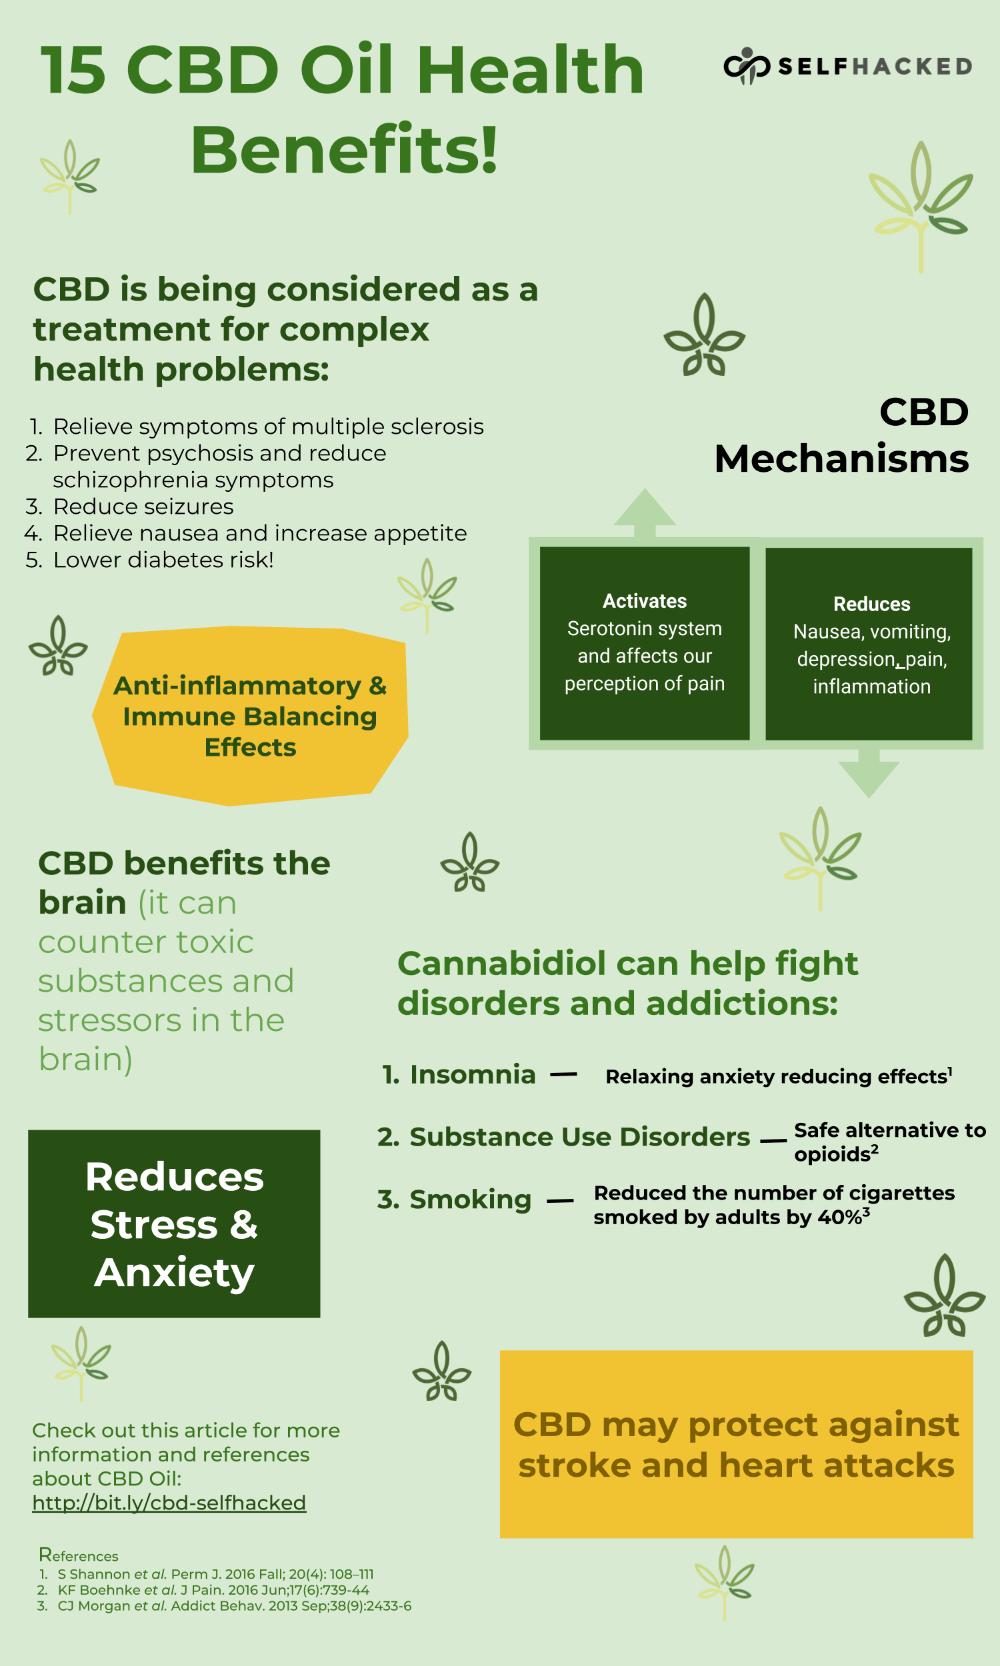 24 CBD Oil Health Benefits & Effects (Cannabidiol